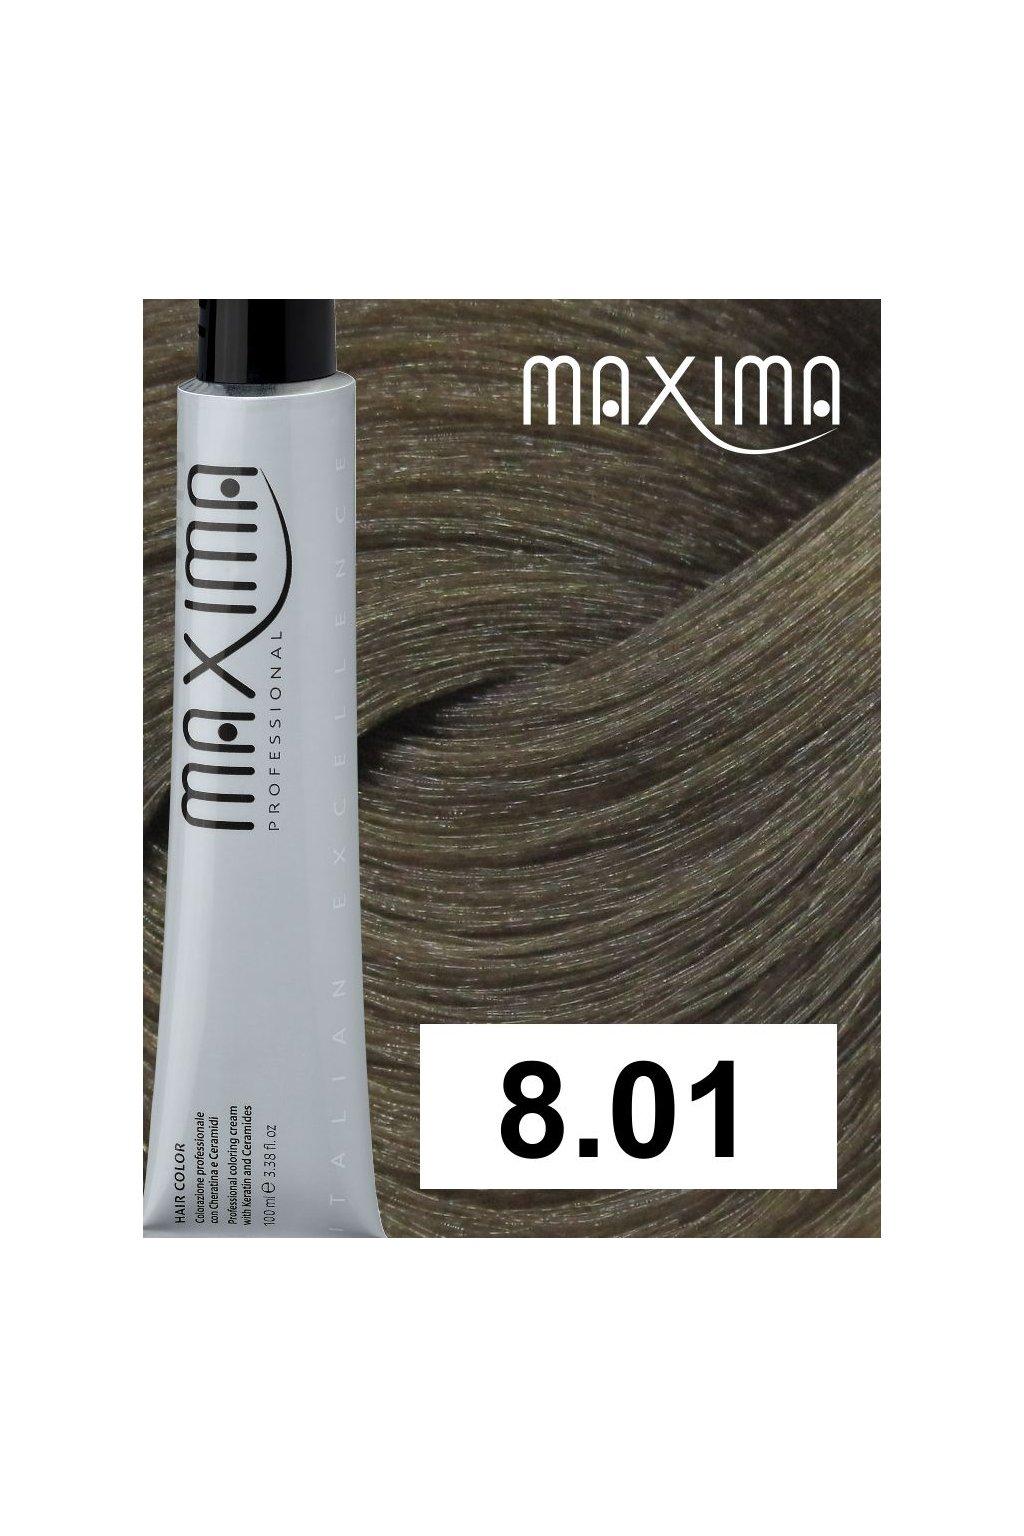 8 01 max